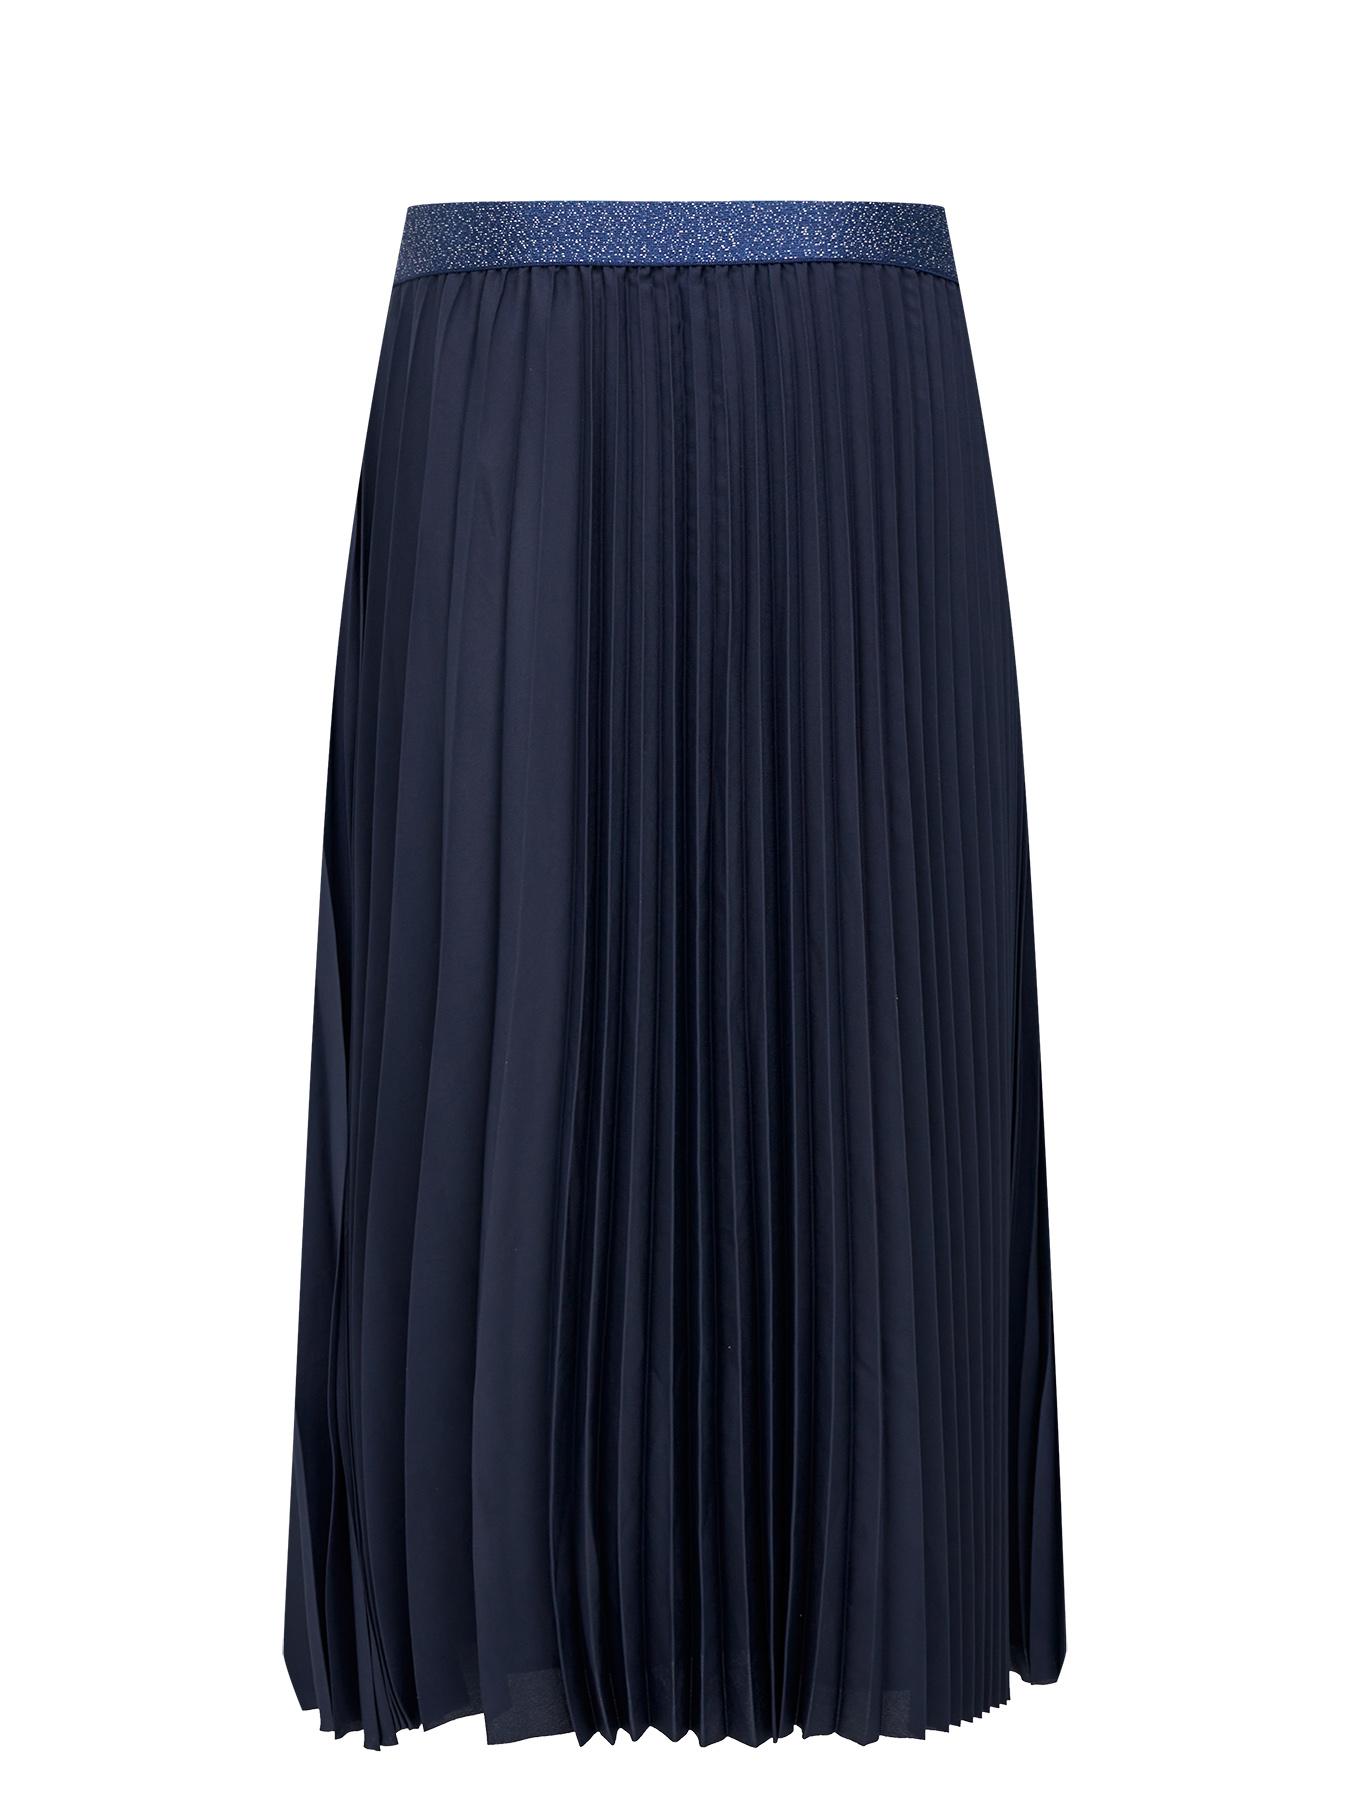 Юбка Laurel Юбка юбка